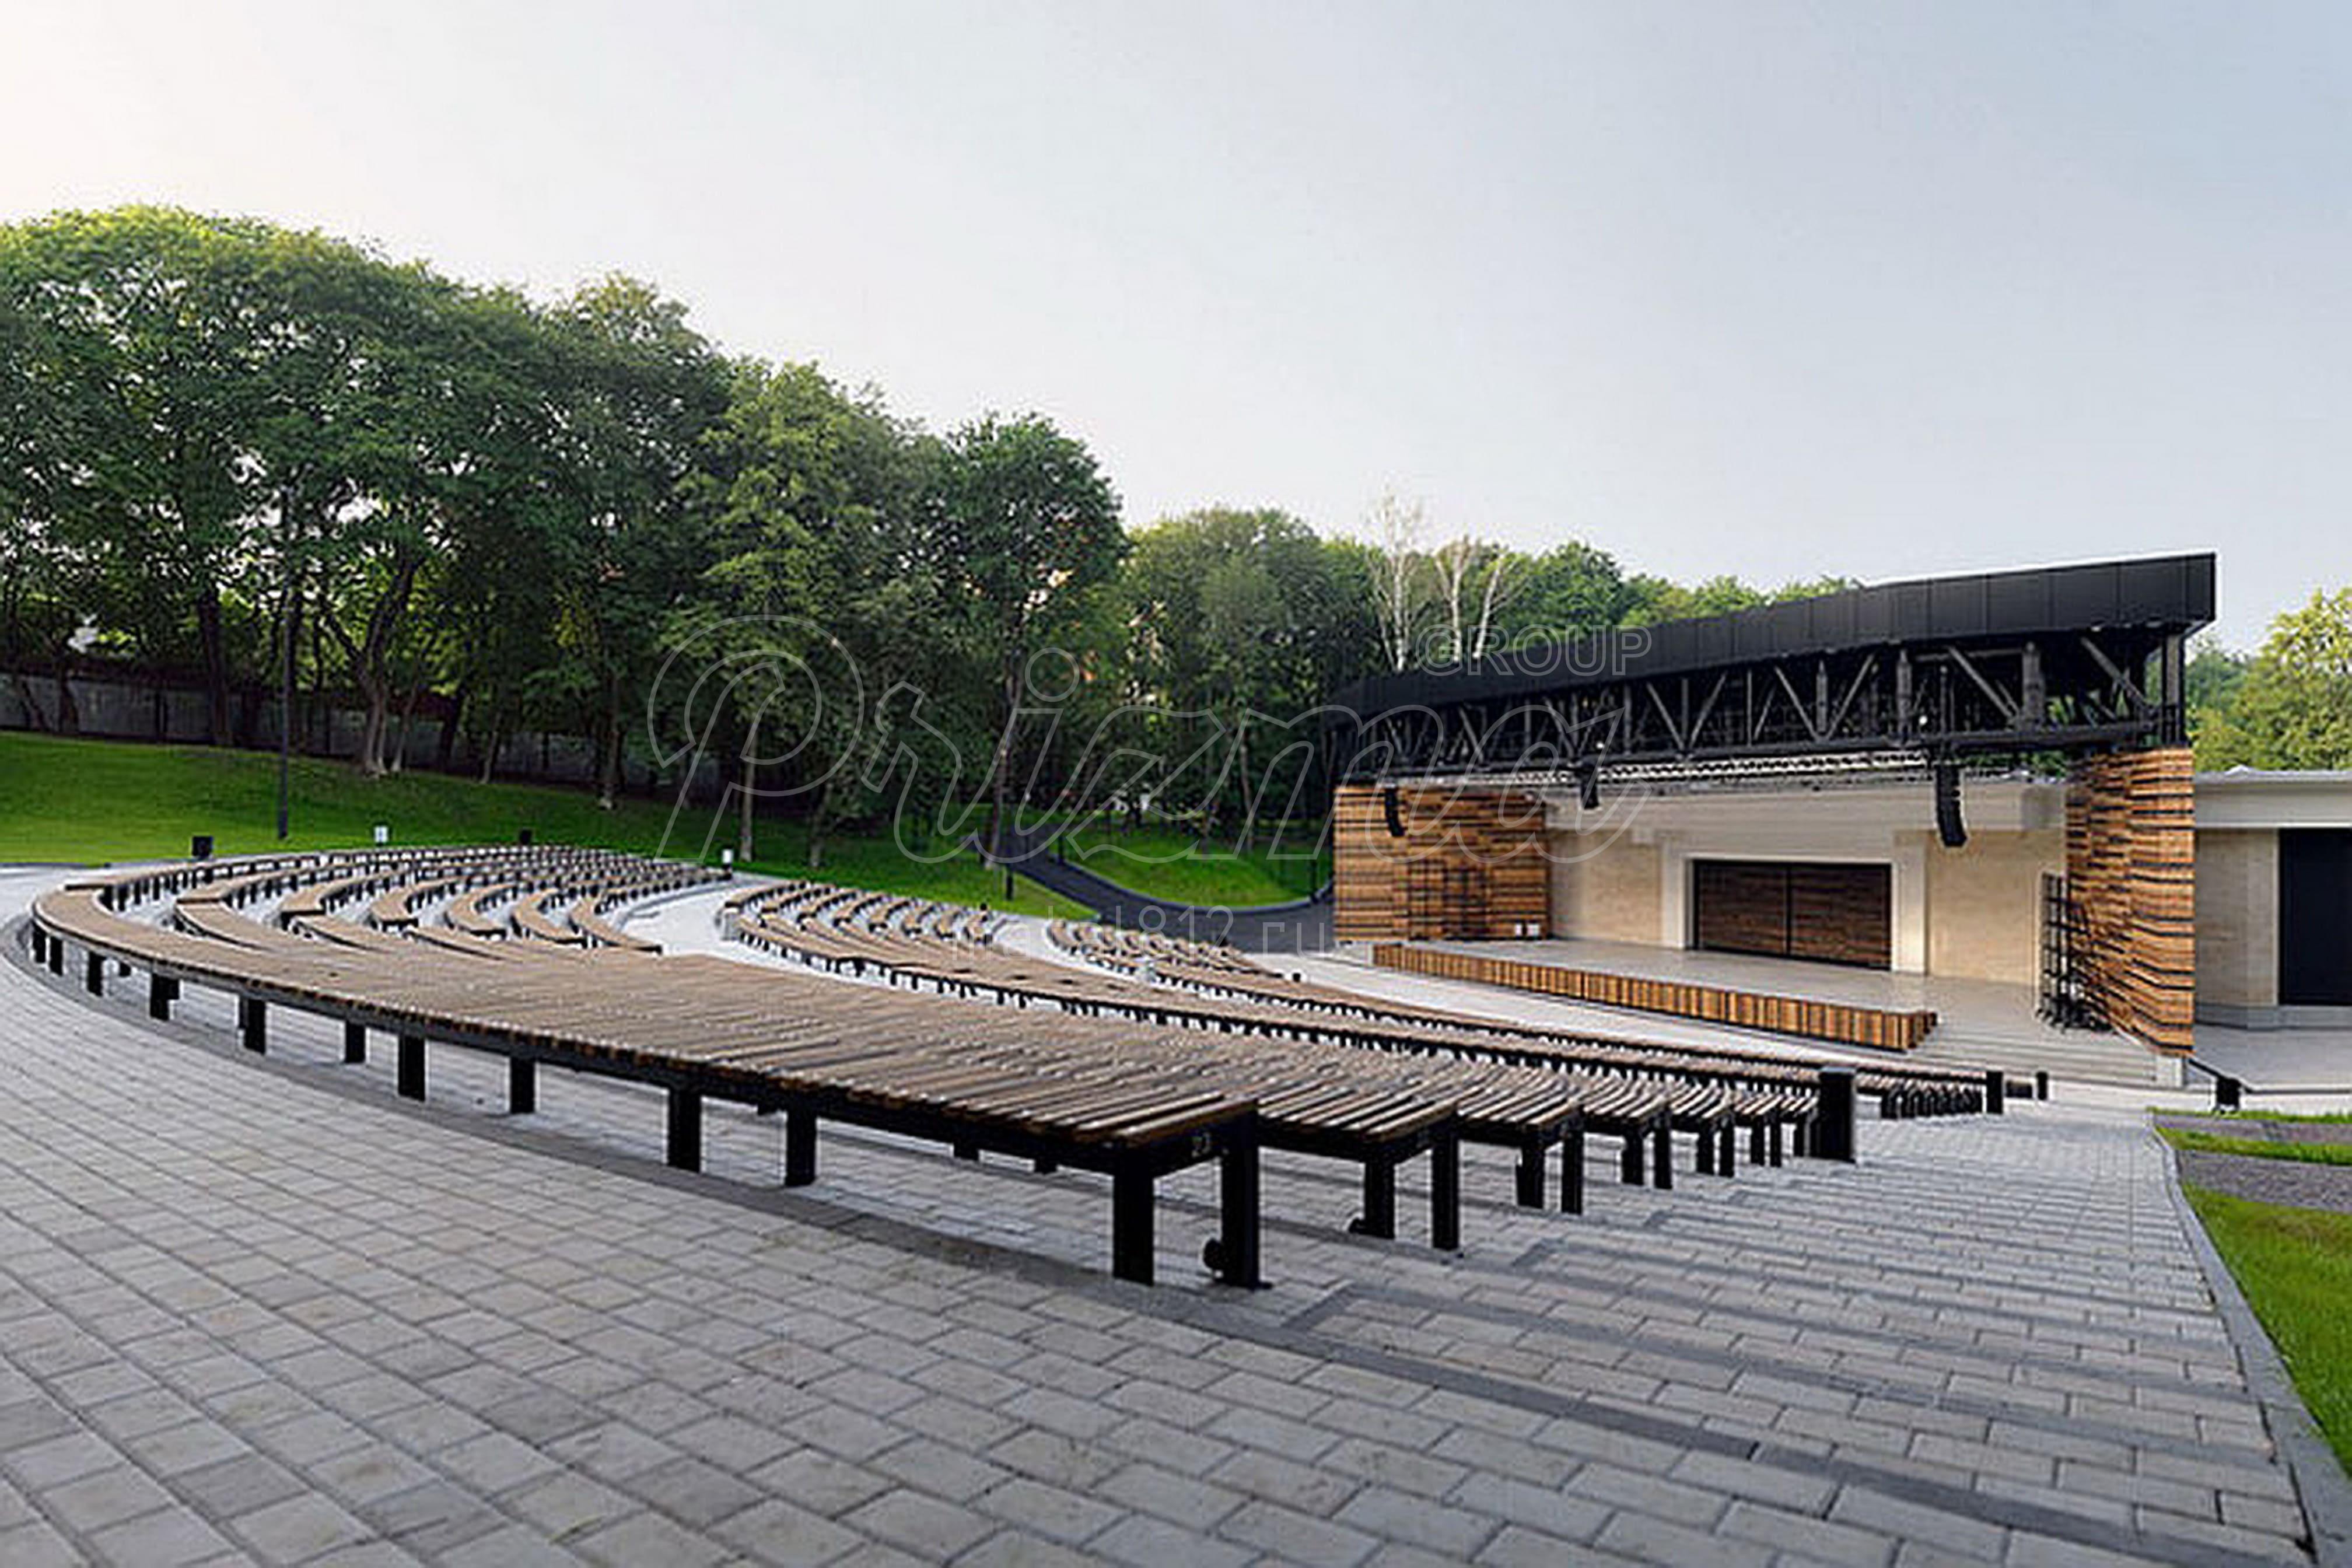 конструкция сцены театра